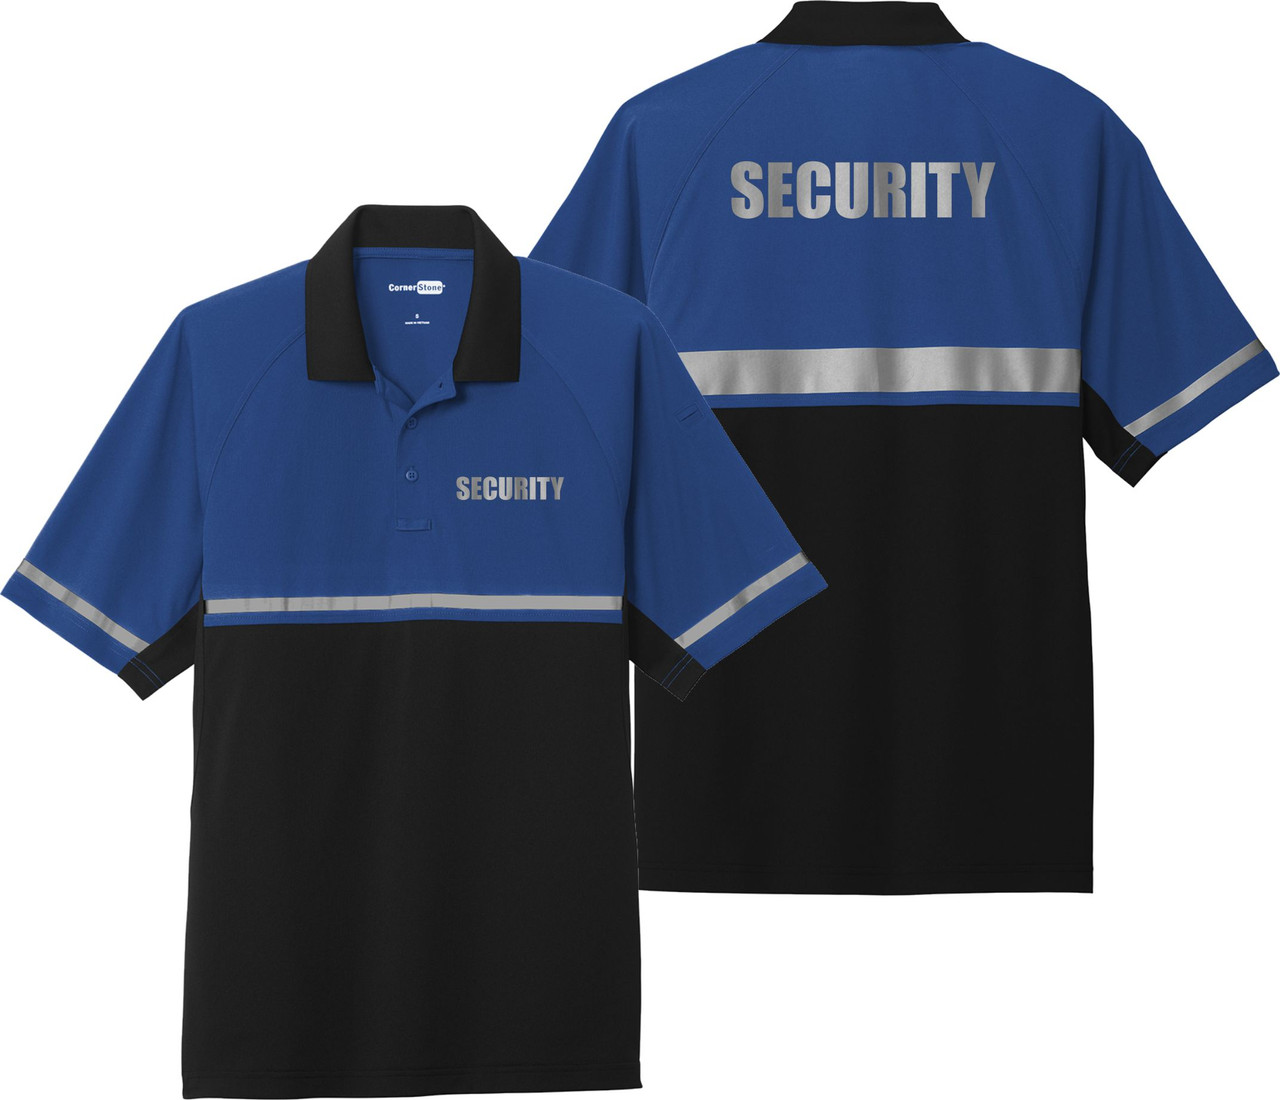 Royal Blue Black Two Tone Security Polo Shirt